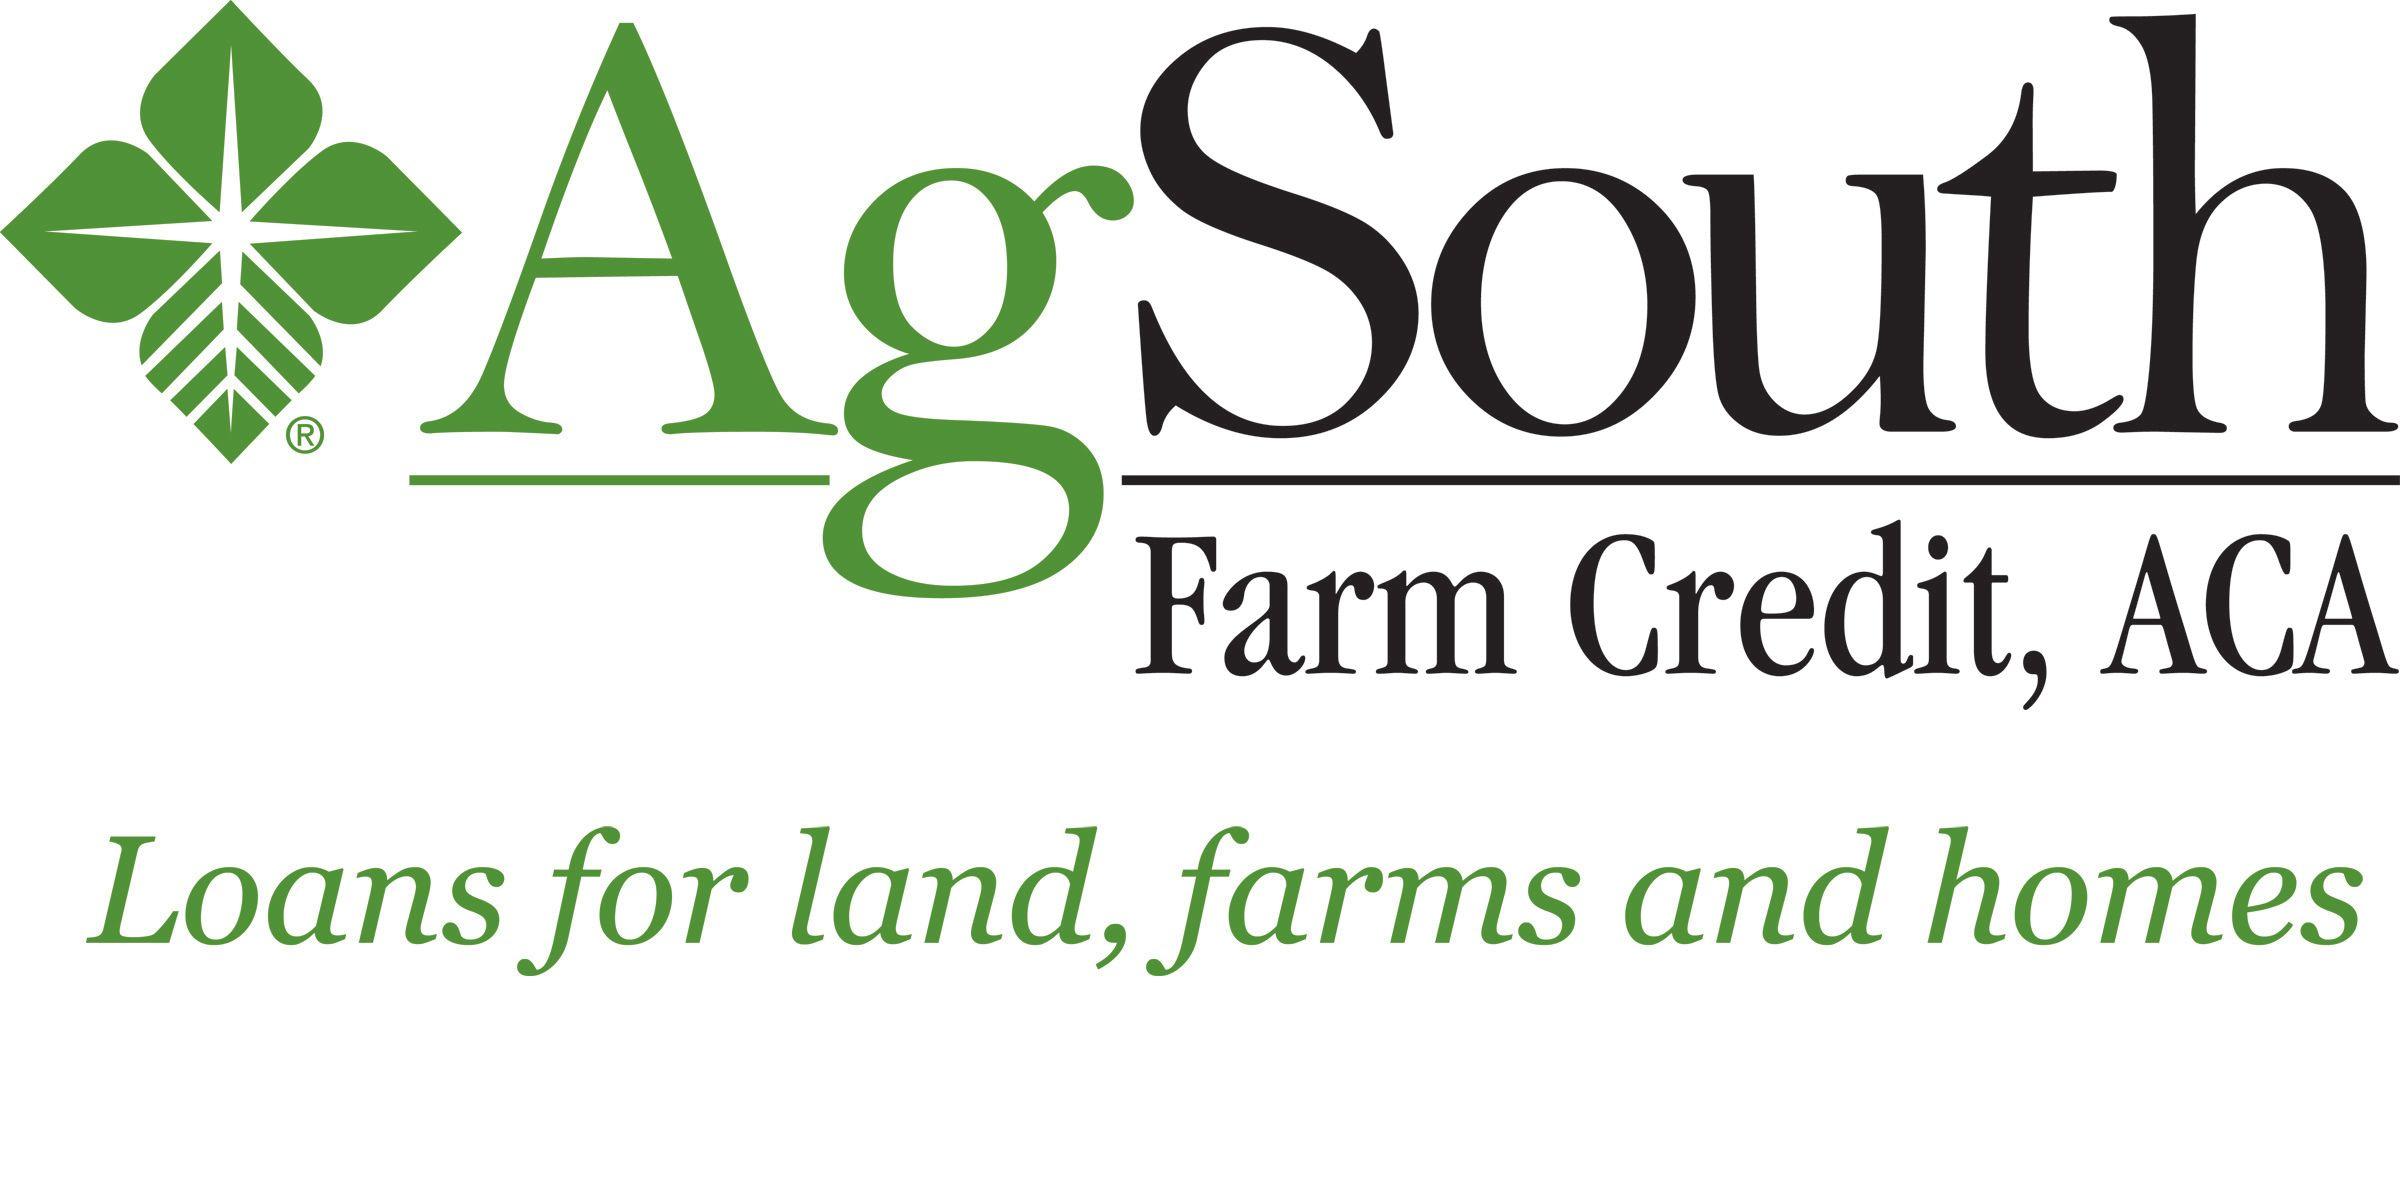 Arborist Certification Review Course